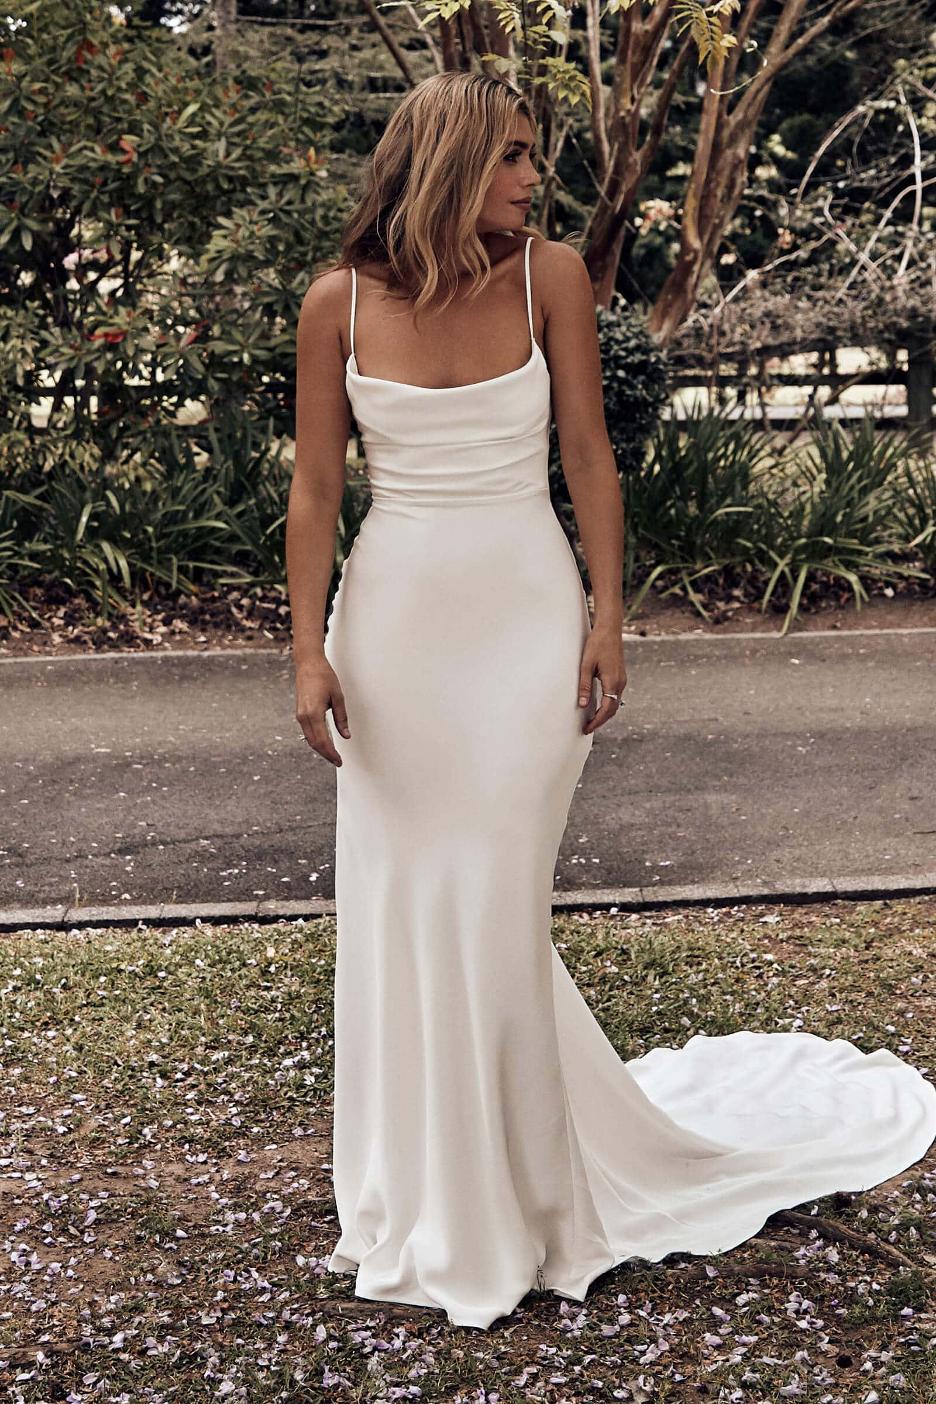 Best Beach Wedding Dresses For Seaside Ceremony Wedding Estates